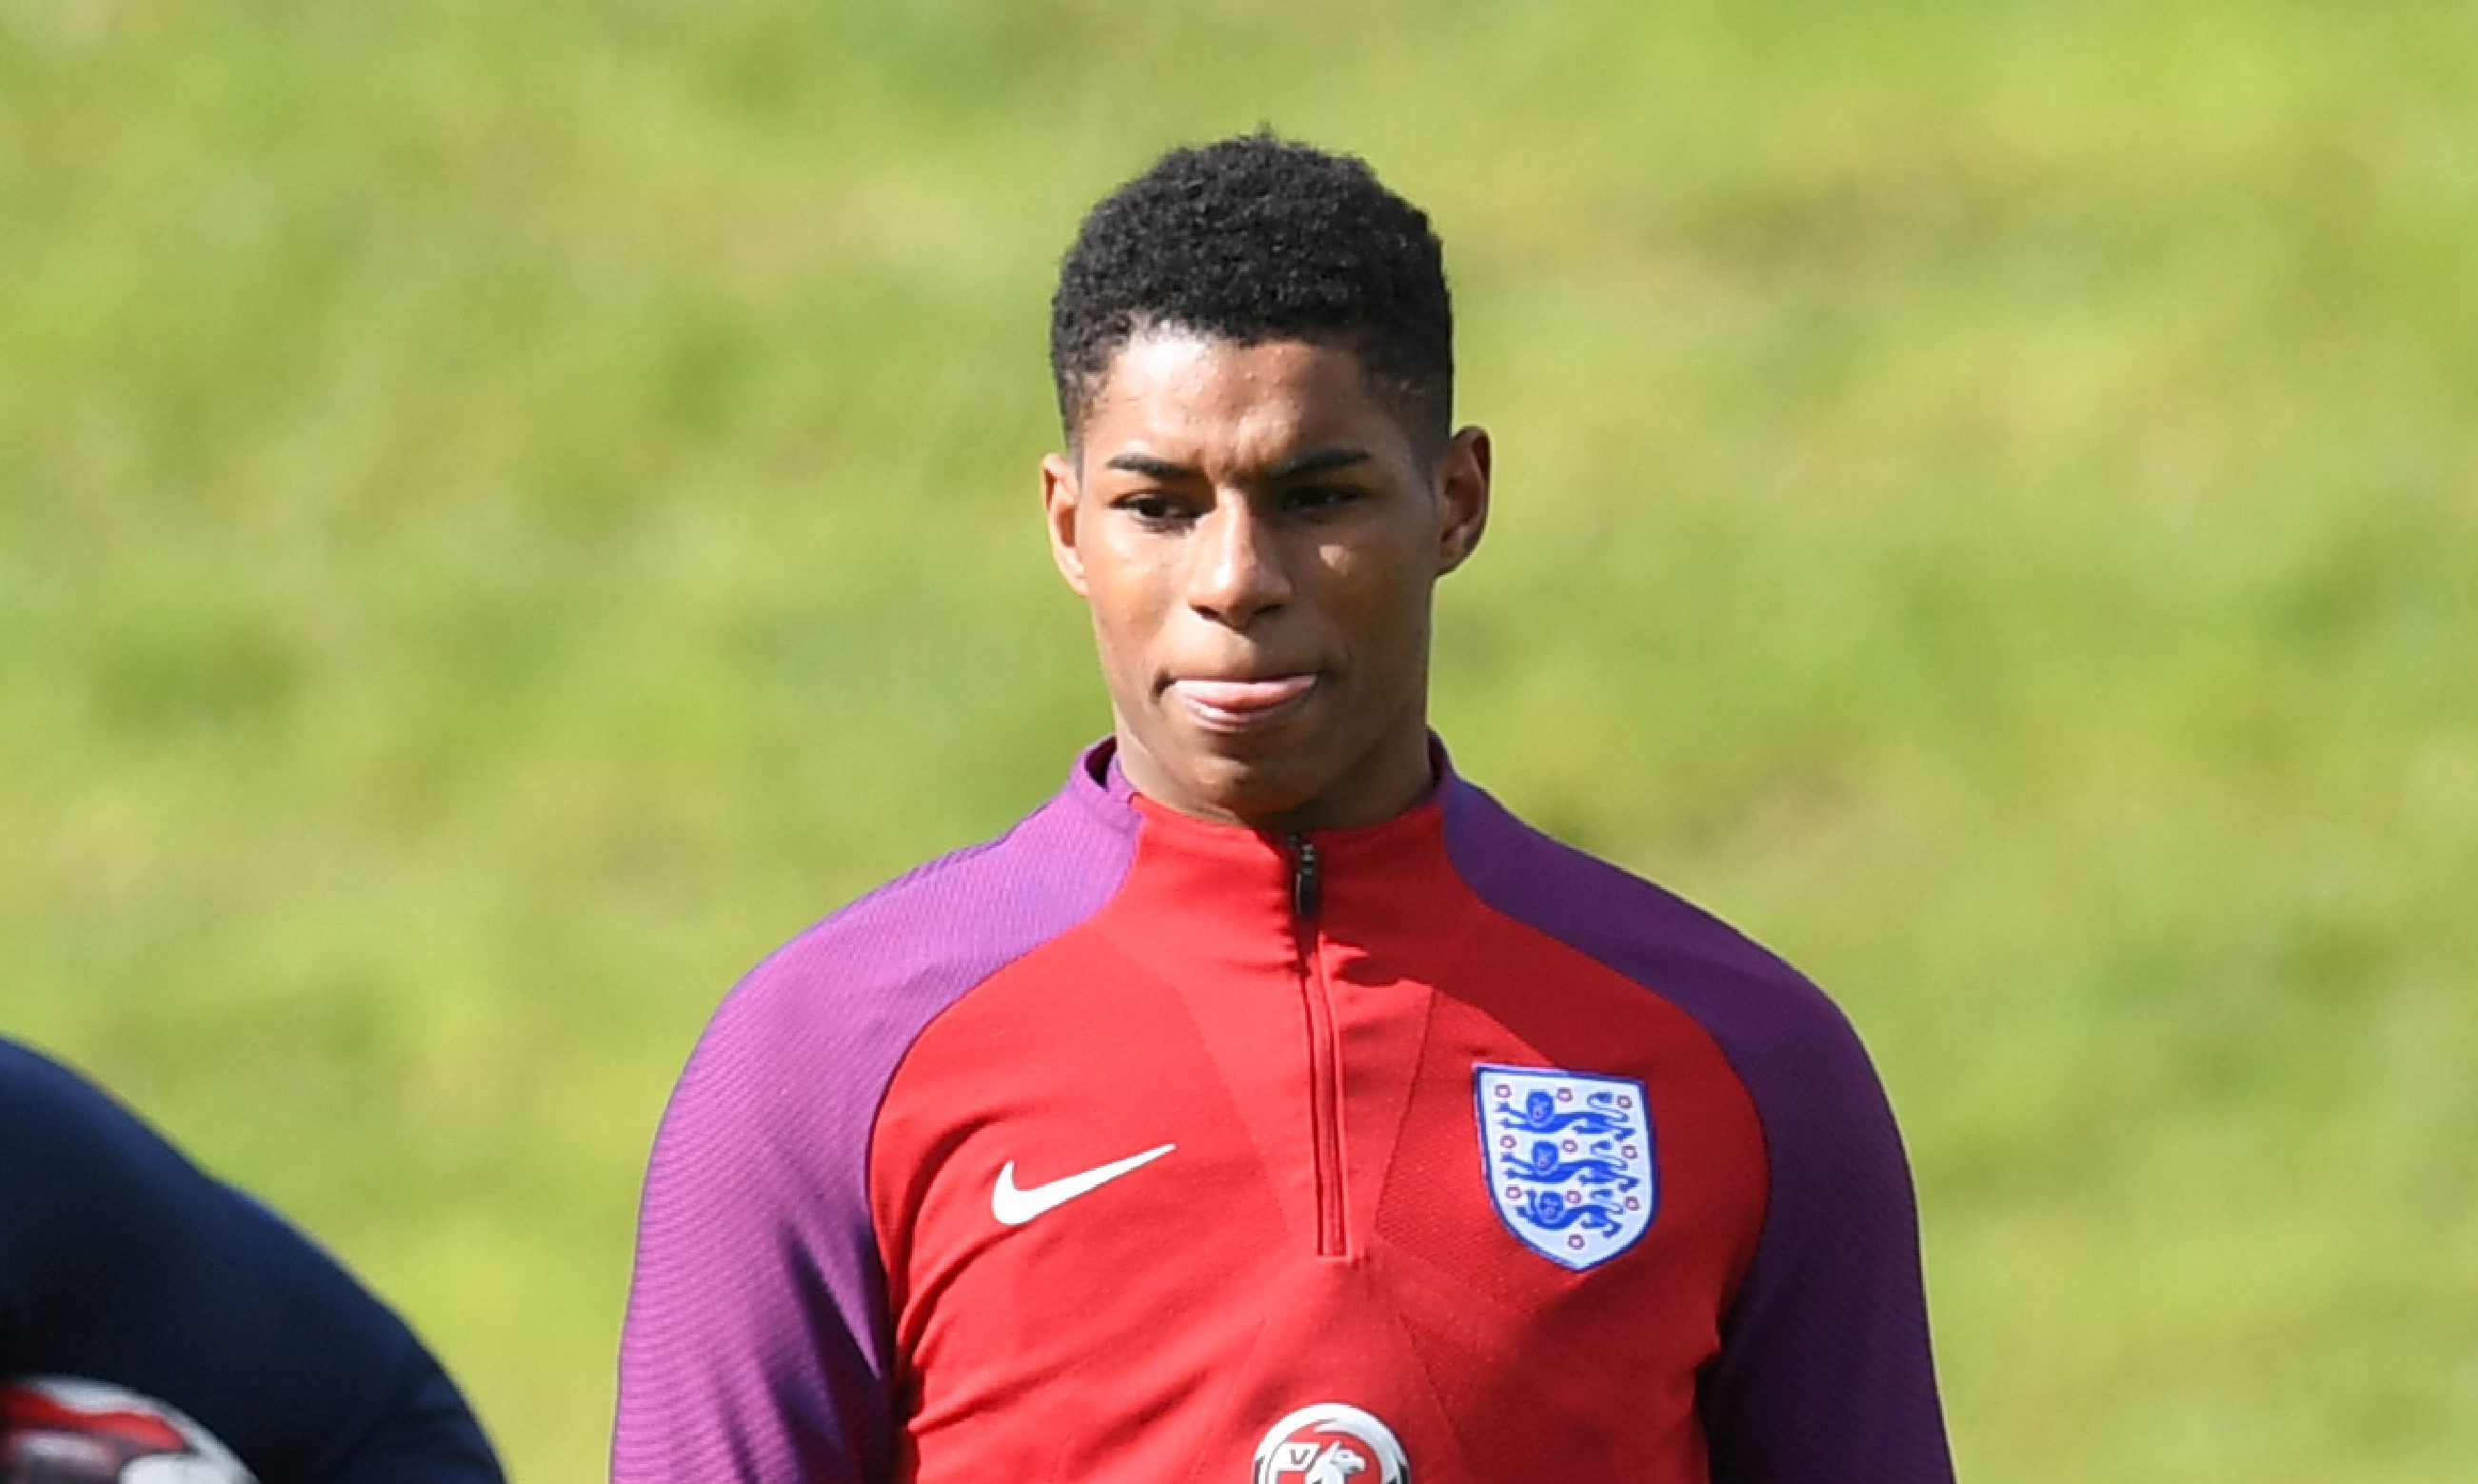 Jermain Defoe teaches Marcus Rashford a lesson in finishing during England training